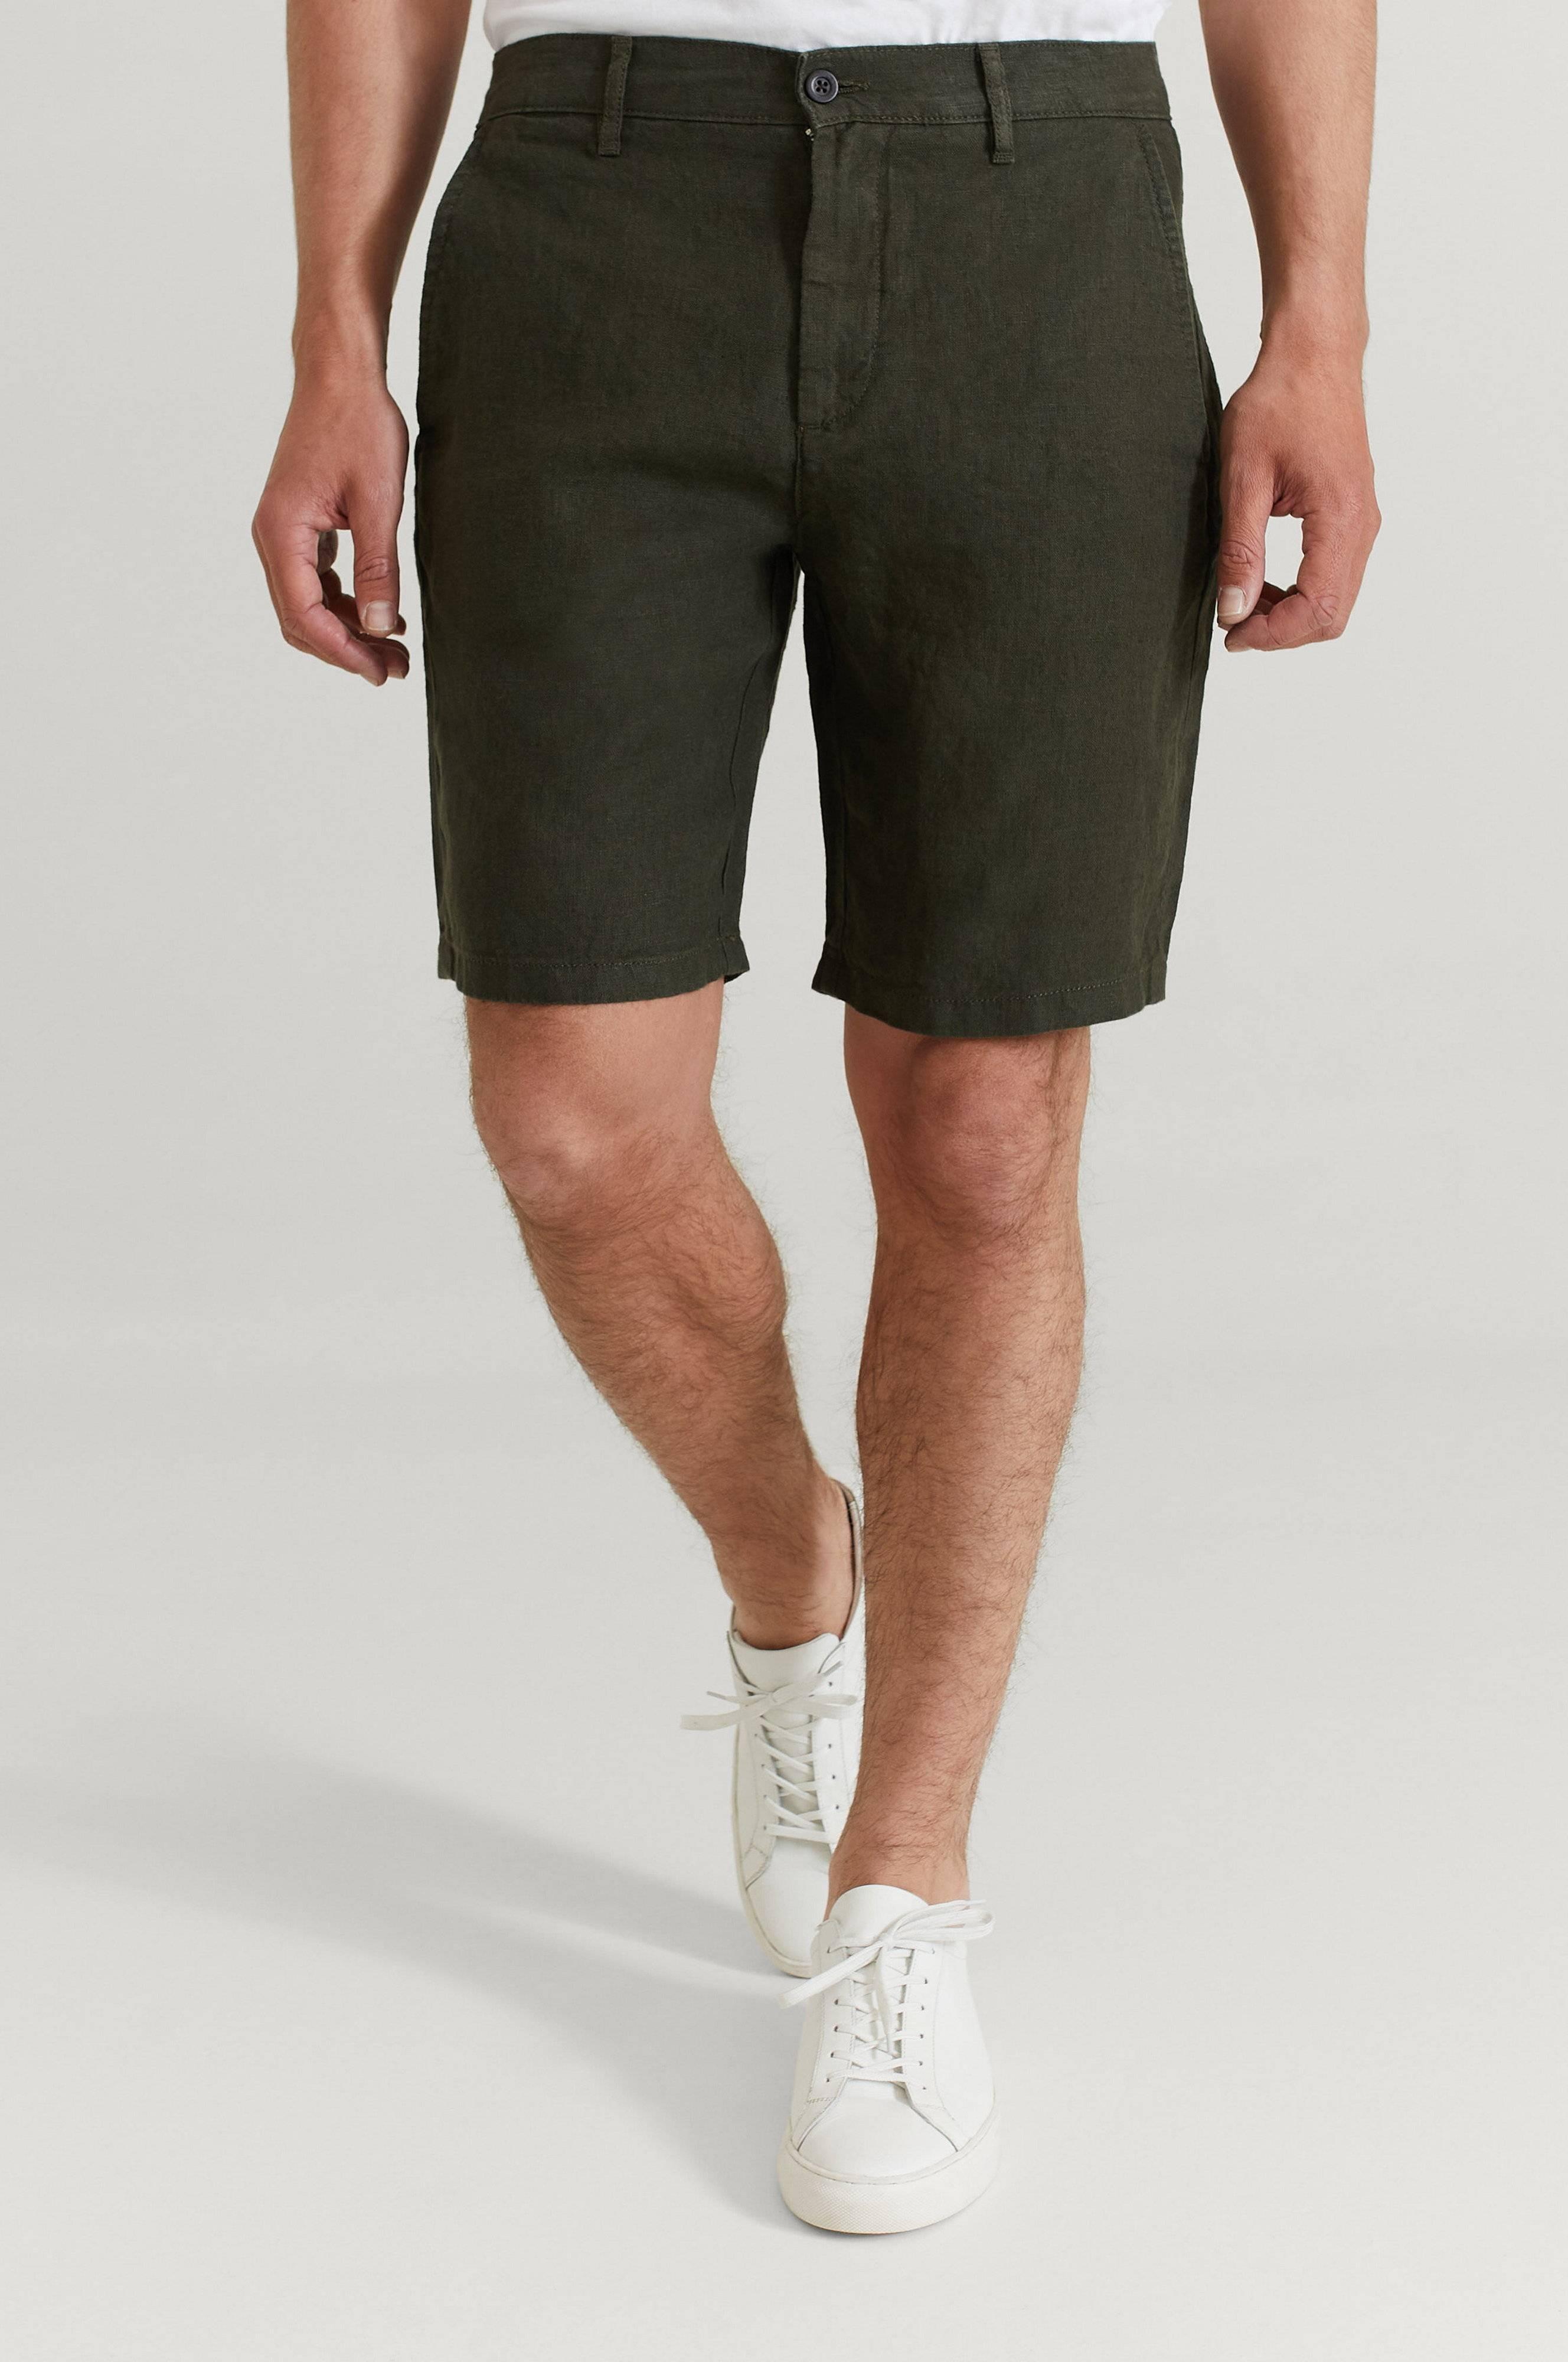 NN07 Shorts Crown Shorts 1196 Army